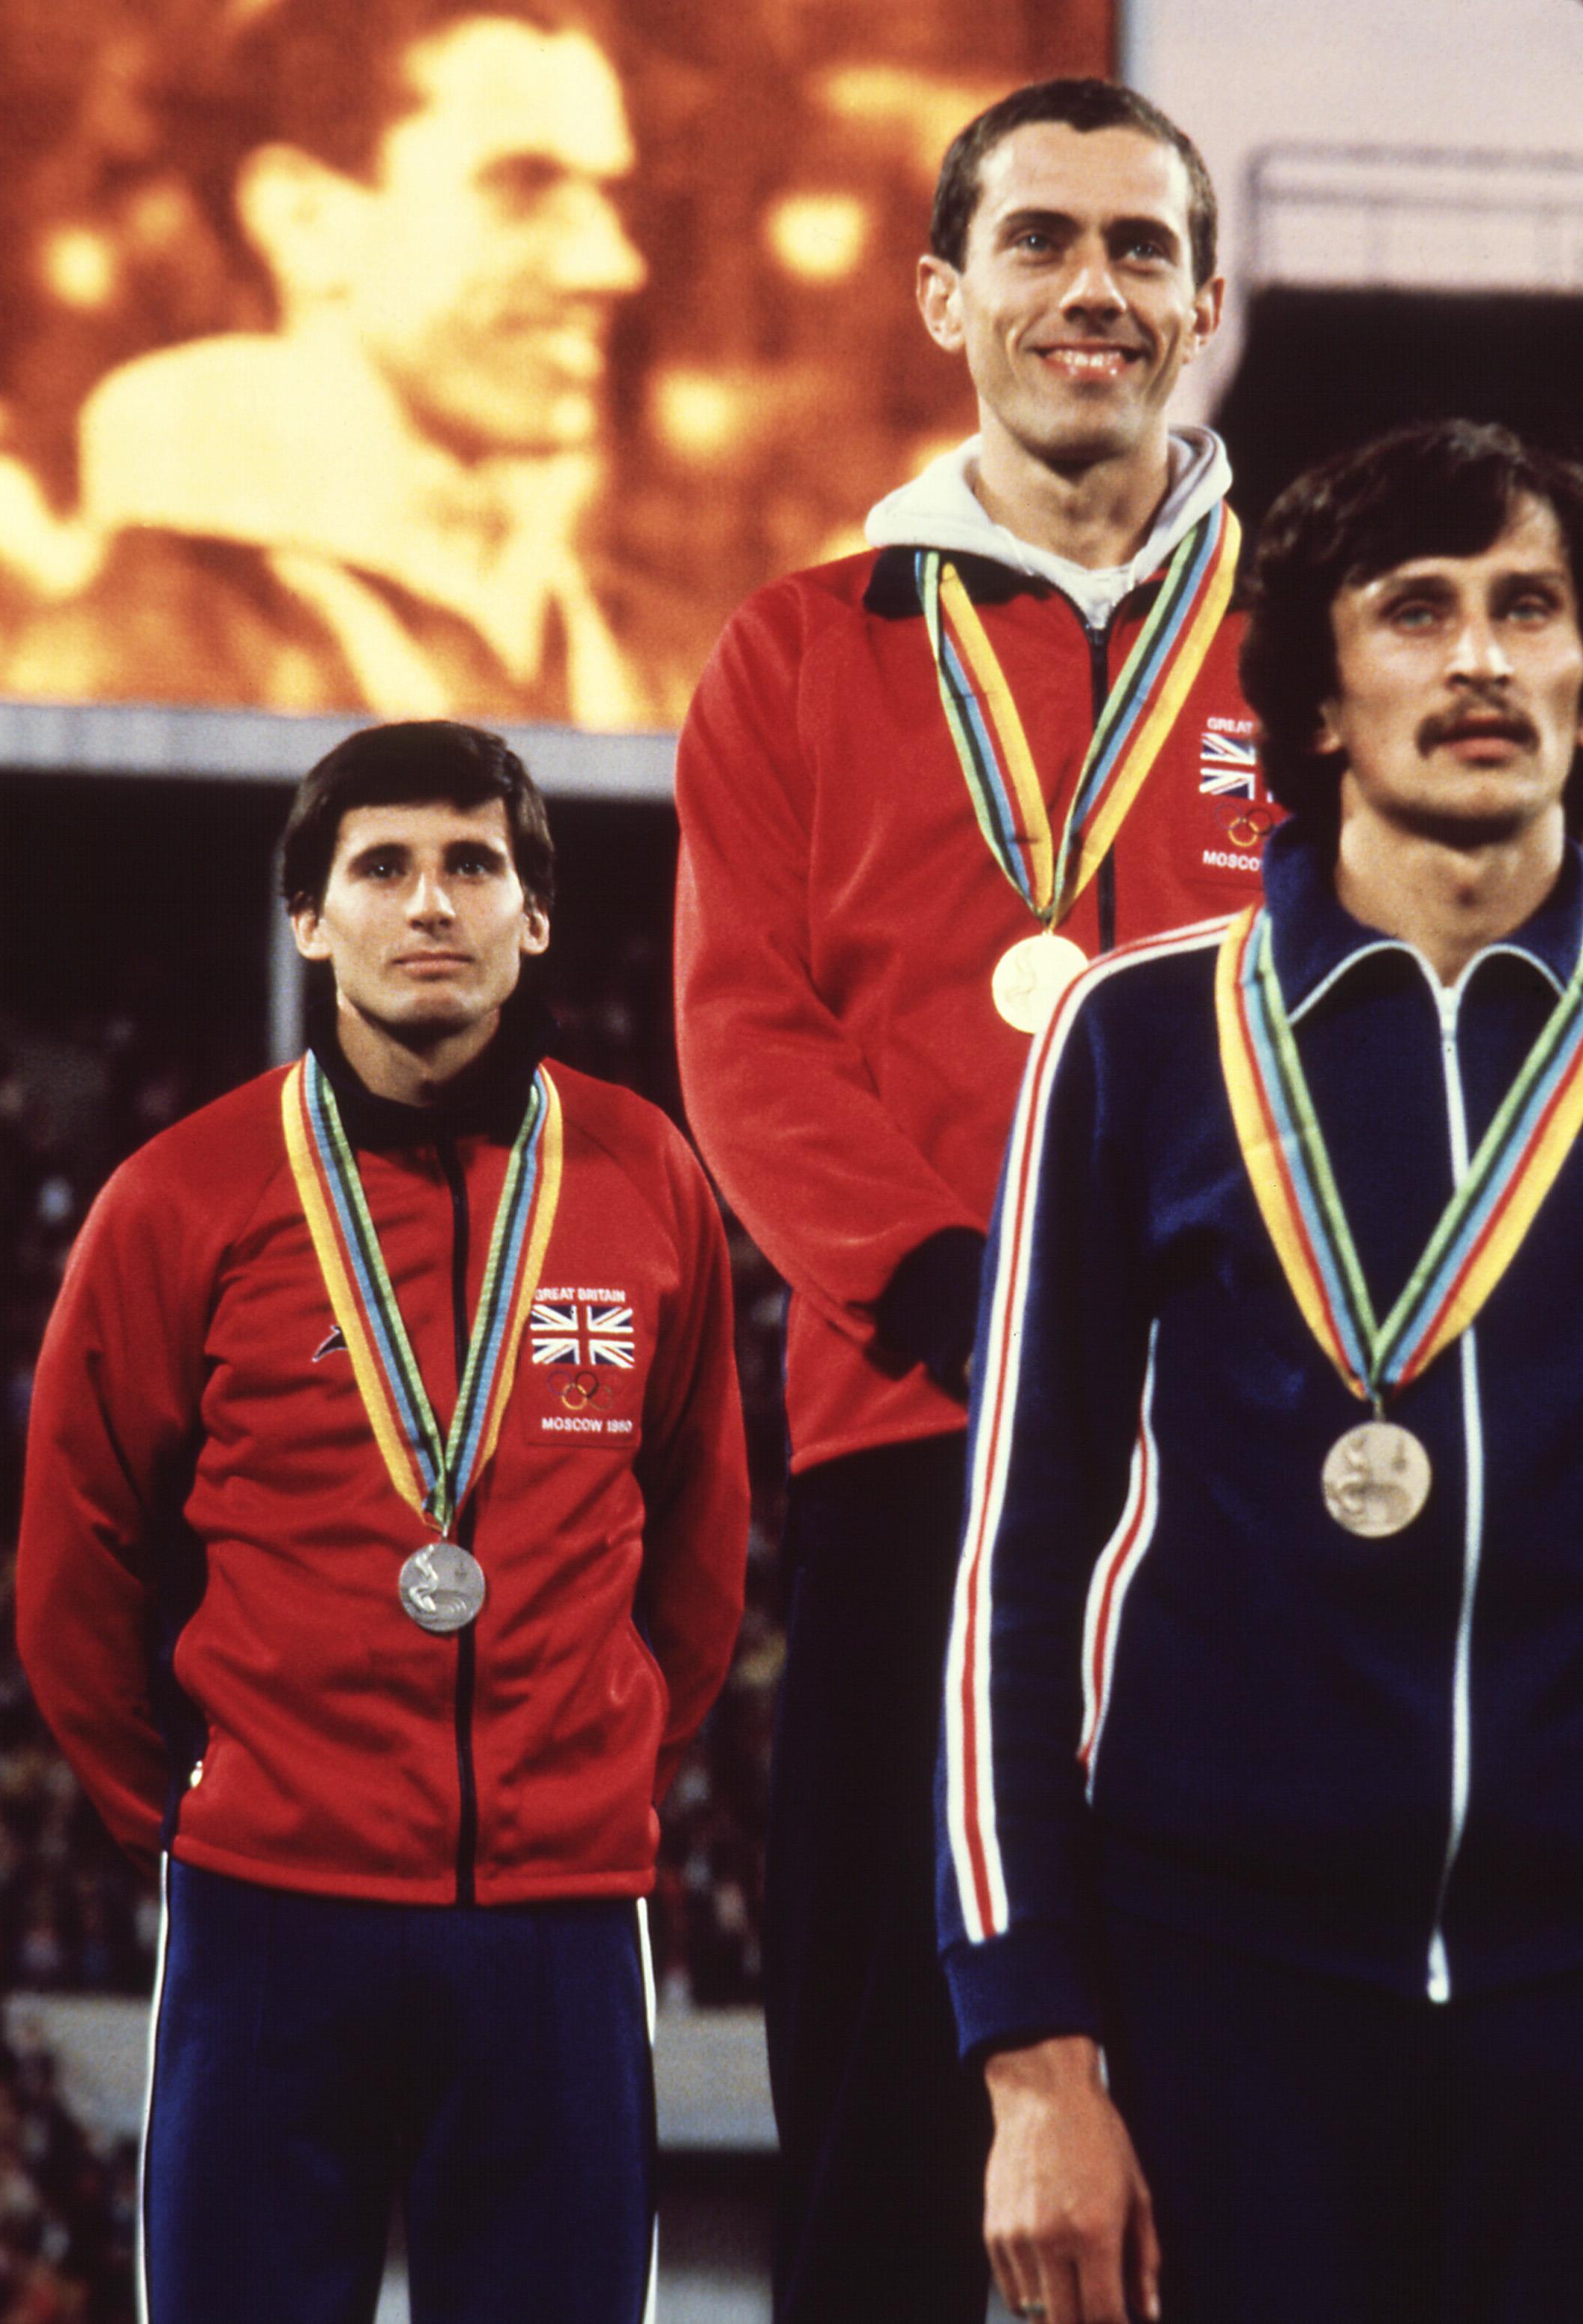 1980 Olympics podium